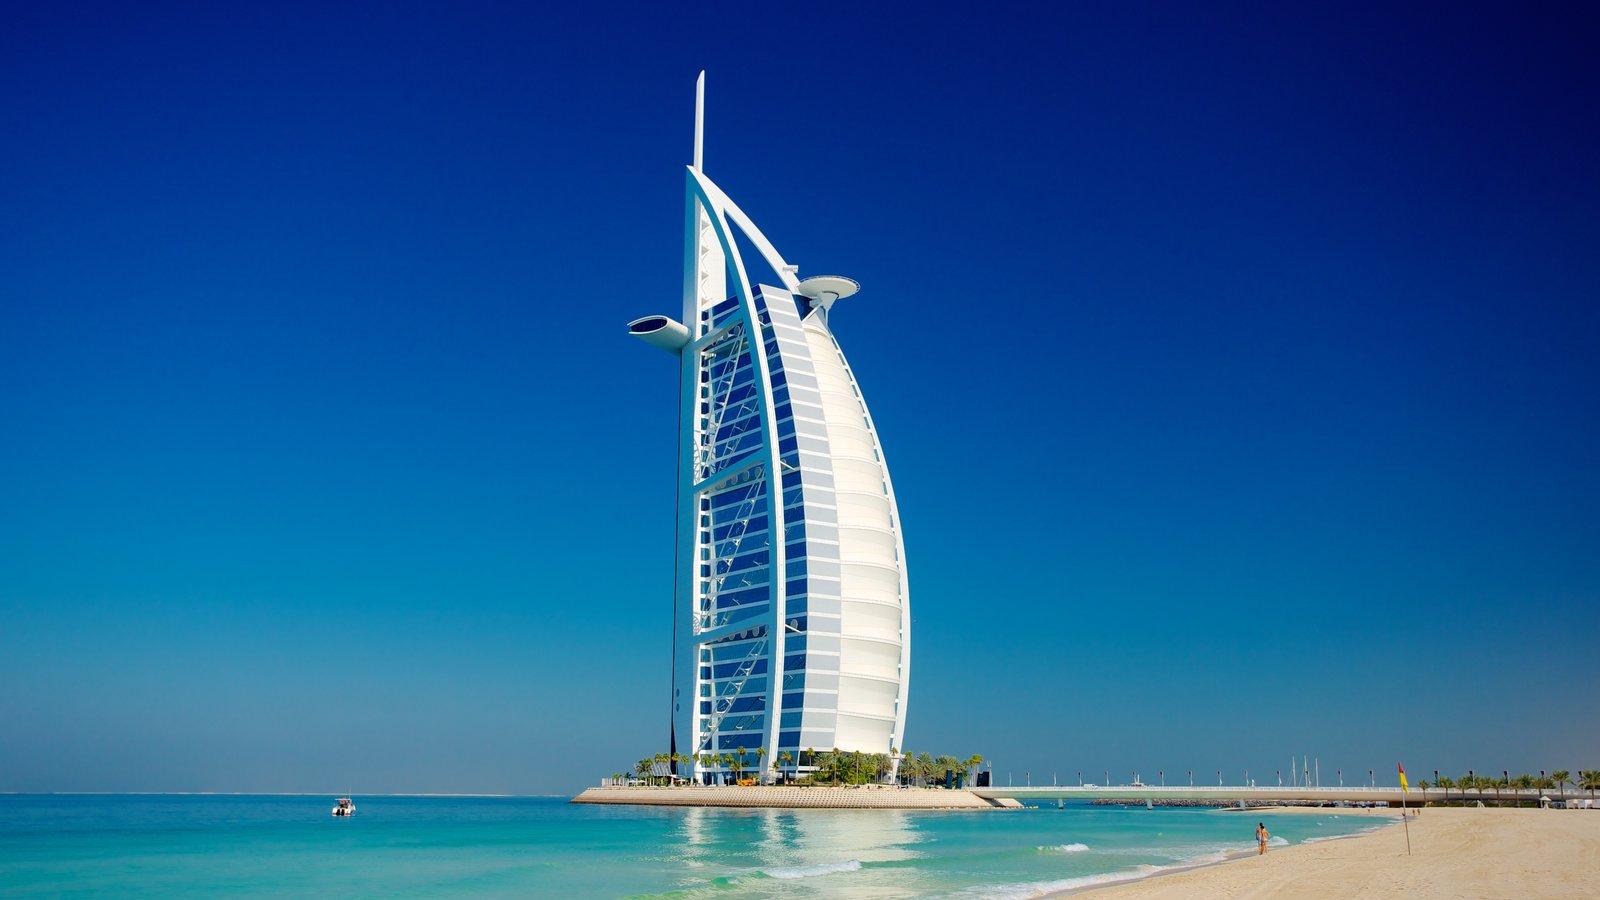 Souk Madinat Jumeirah mostrando horizonte, un edificio de gran altura y arquitectura moderna